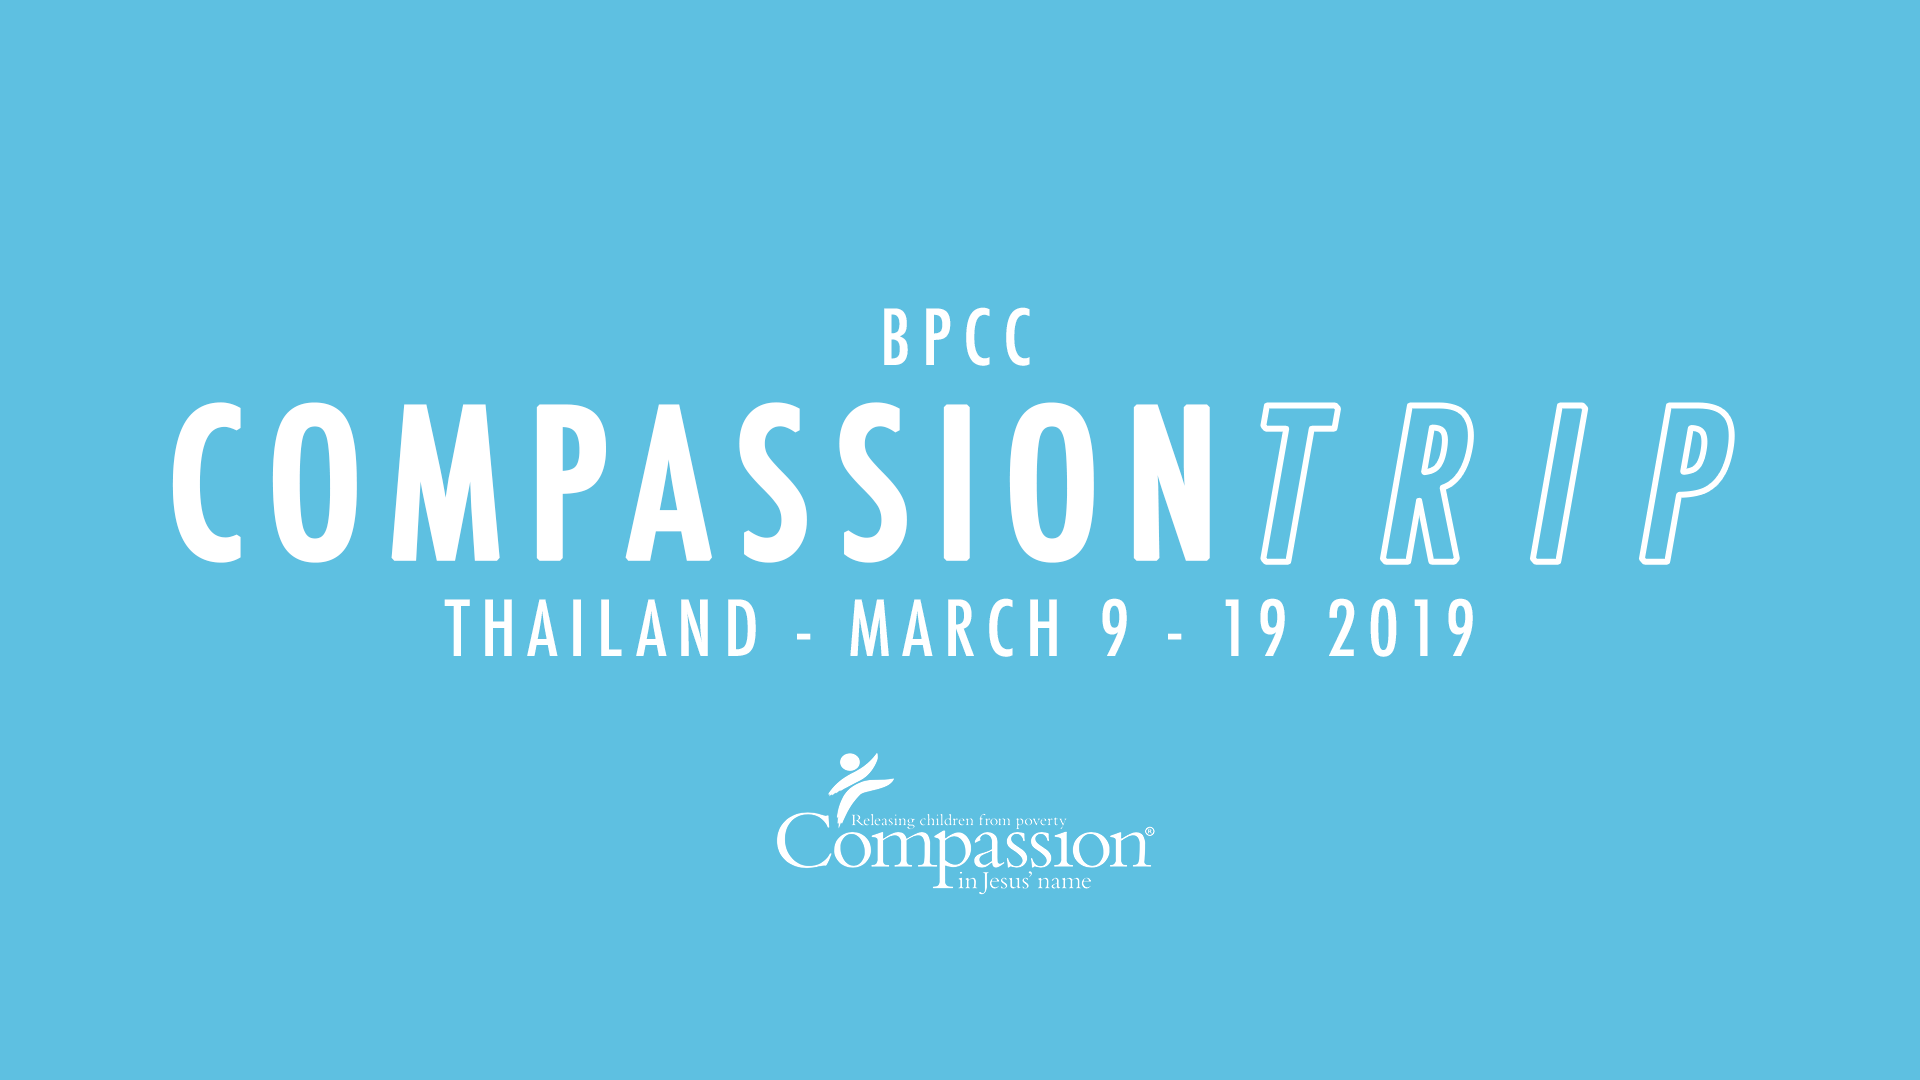 Compassiontrip2019